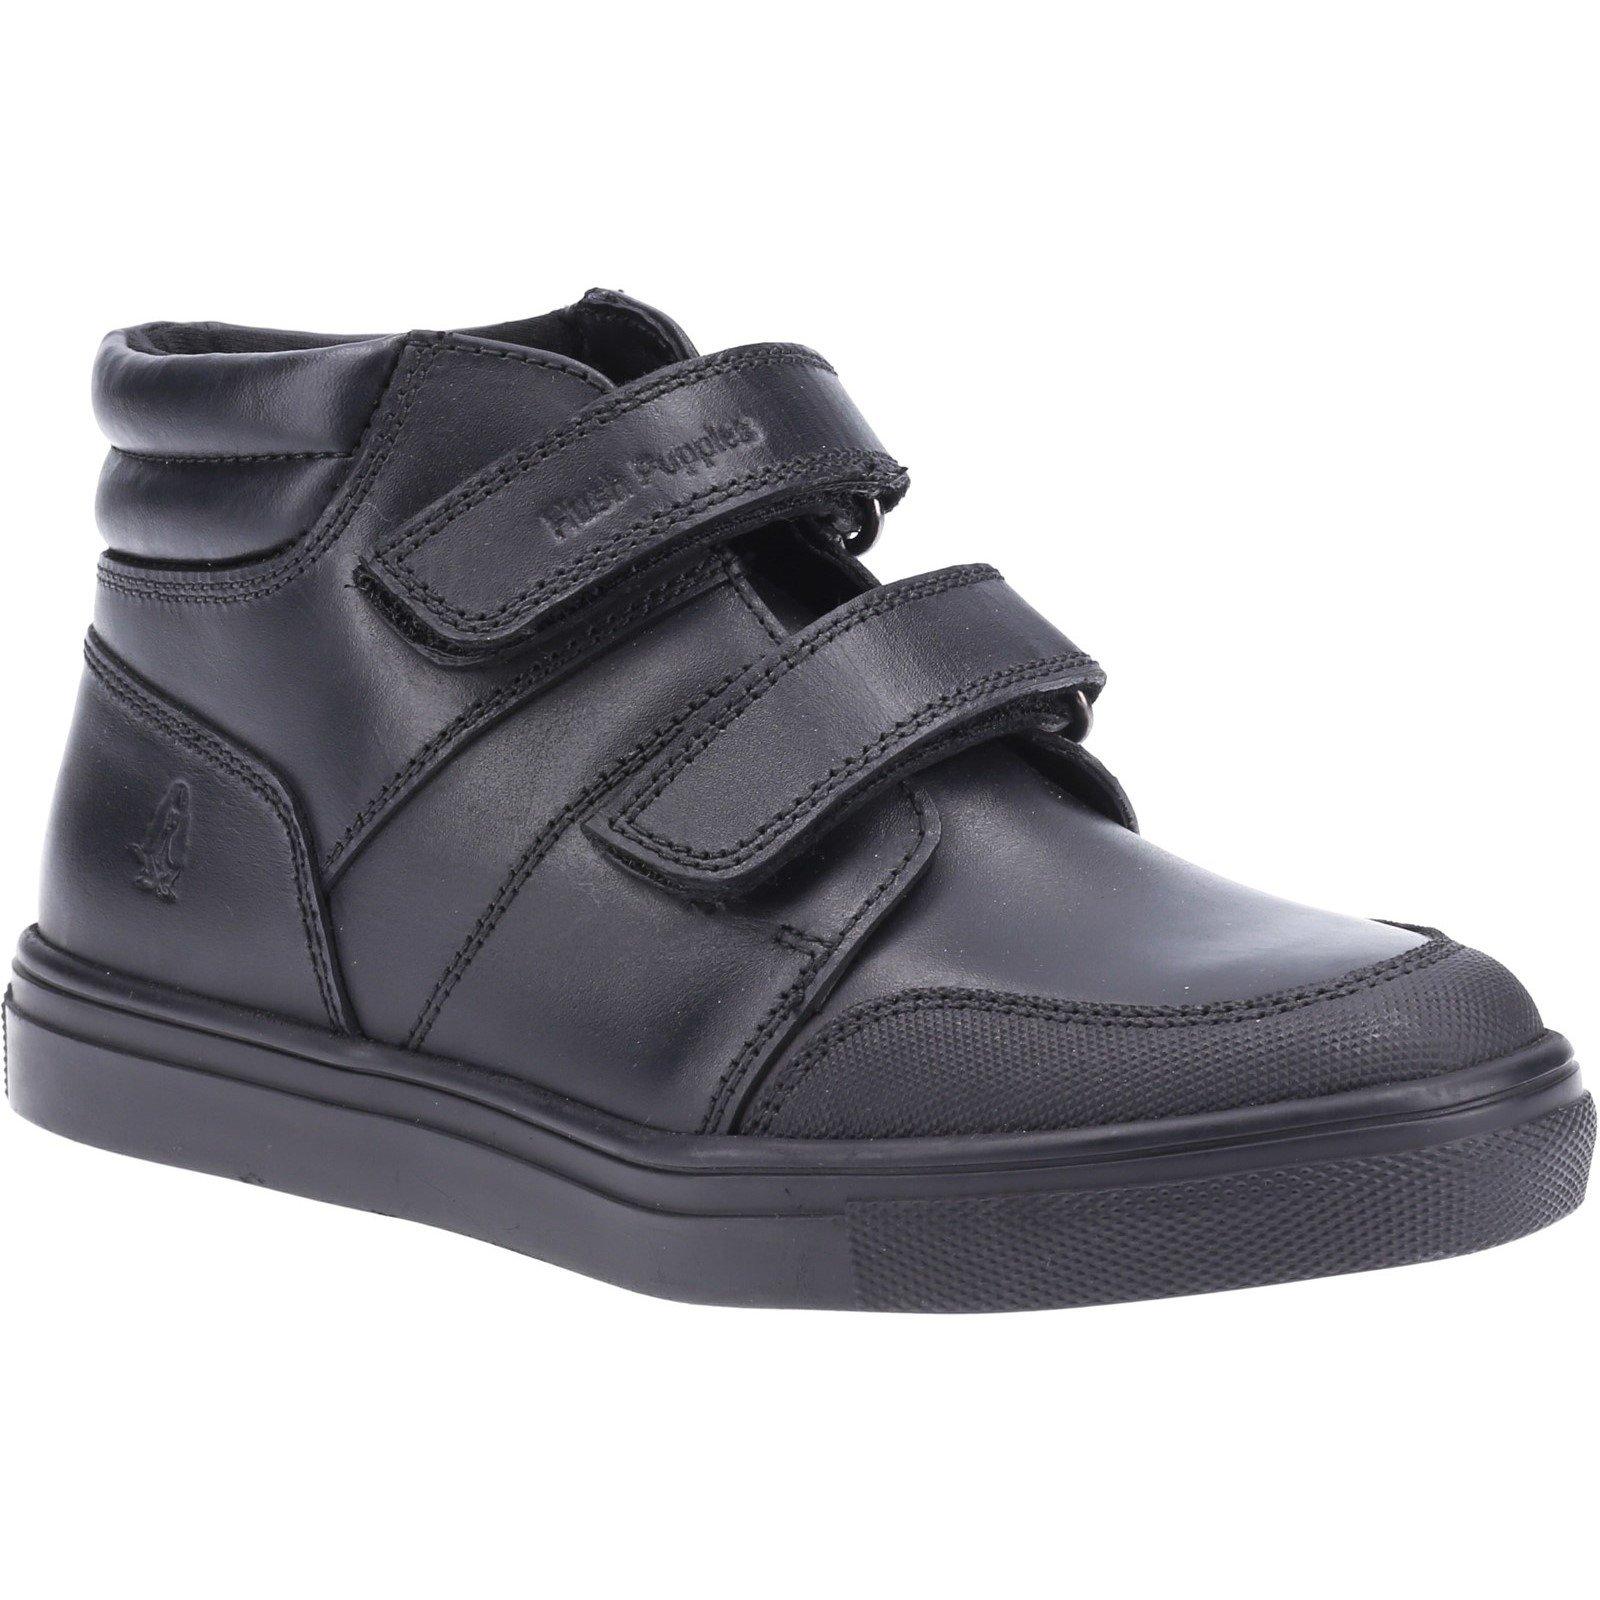 Hush Puppies Kid's Seth Senior School Boot Black 32570 - Black 4